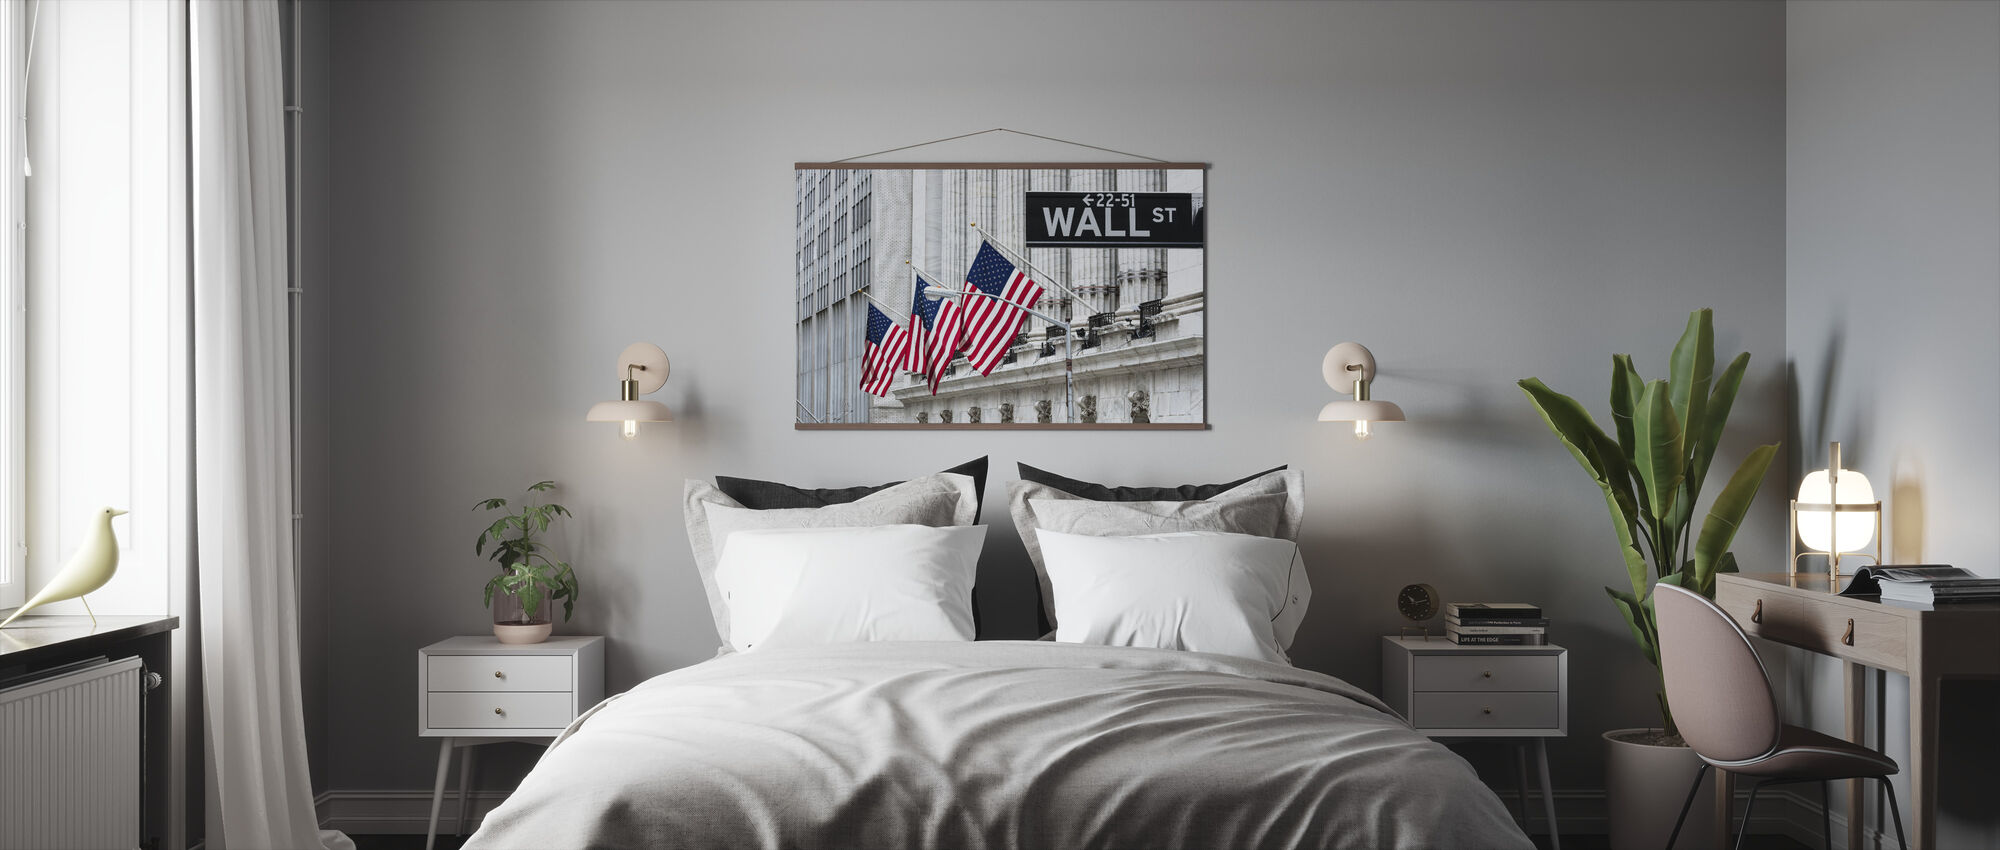 New York Wall Street - Poster - Bedroom